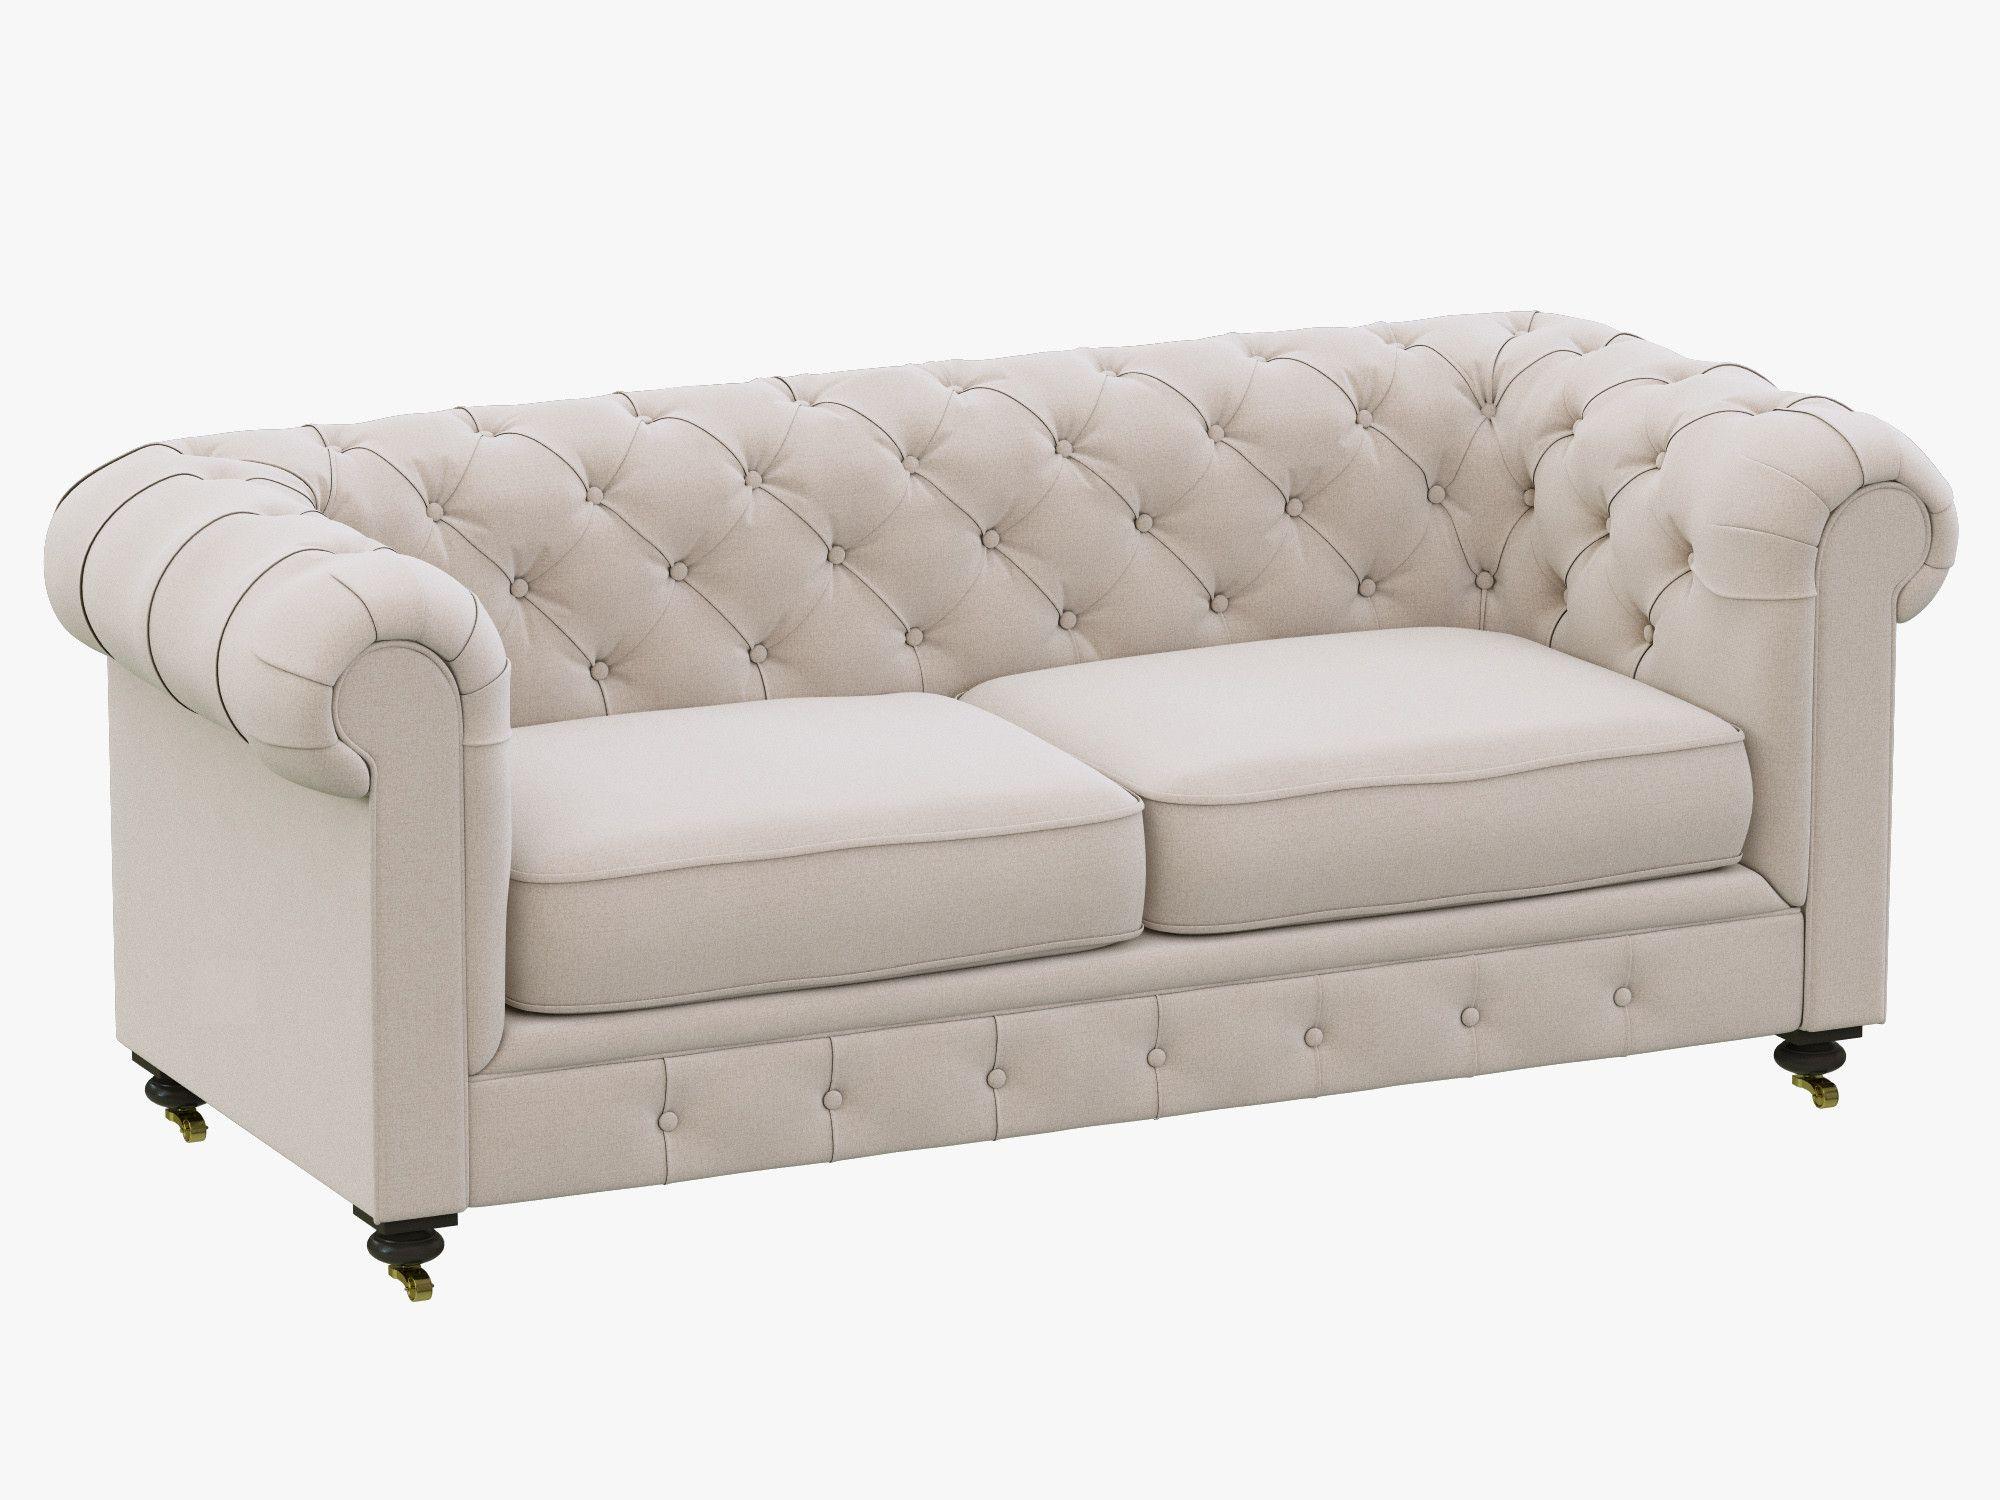 Restoration Hardware Petite Kensington Upholstered Sofa Model Available On  Turbo Squid, The Worldu0027s Leading Provider Of Digital Models For  Visualization, ...